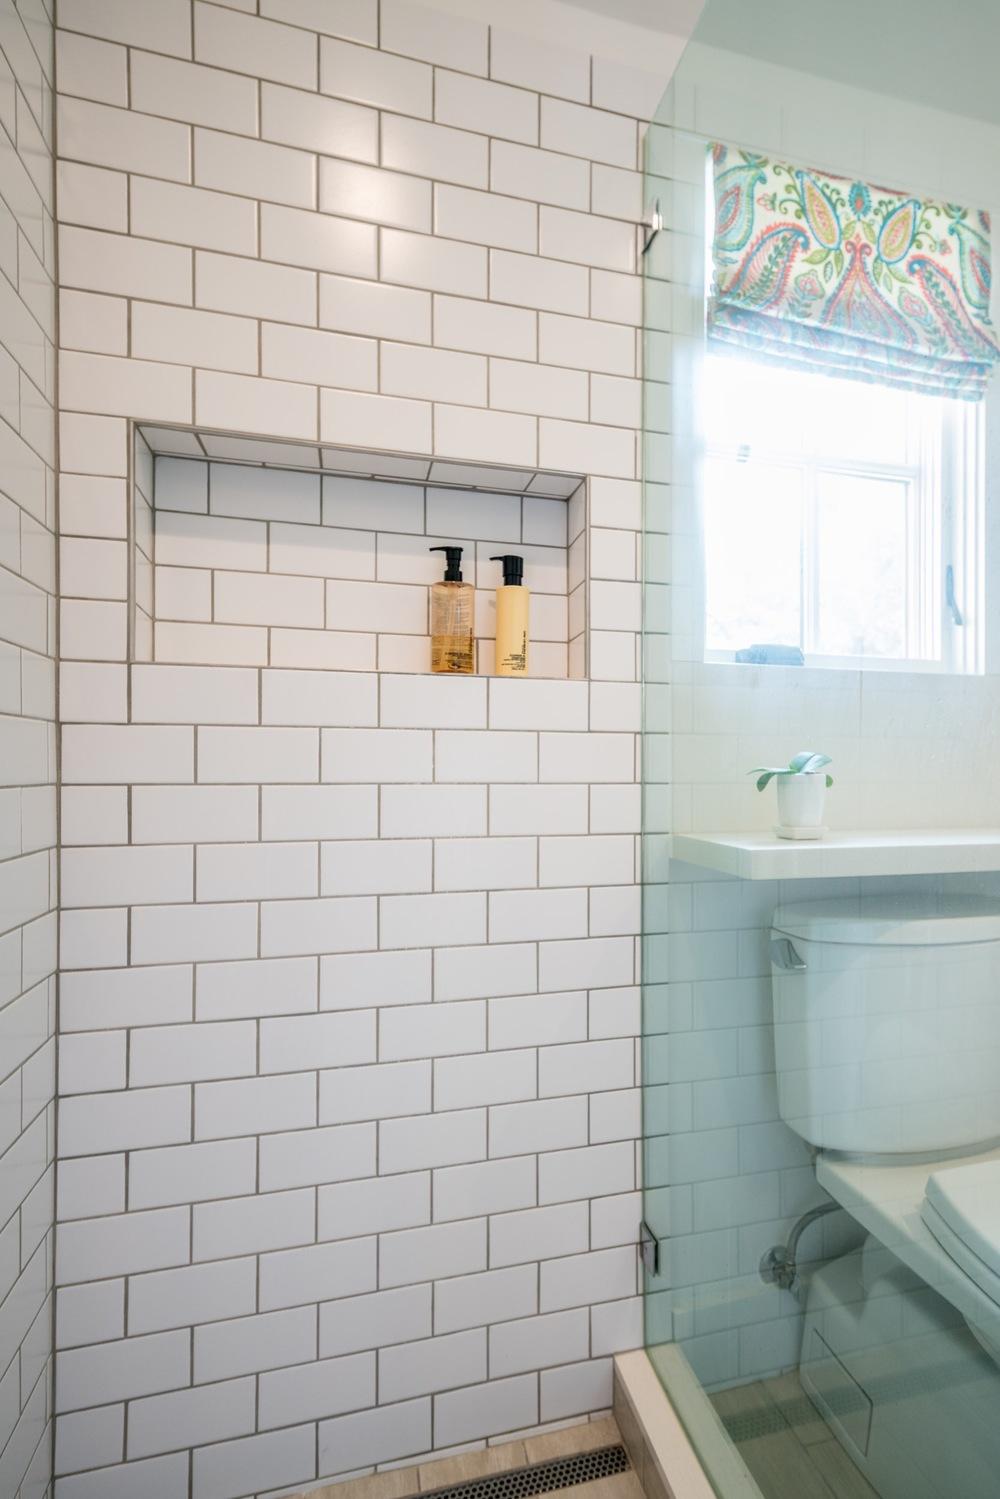 160113_Eisenman_Arch_Merced_Bath2_ShowerDetail (1).jpg